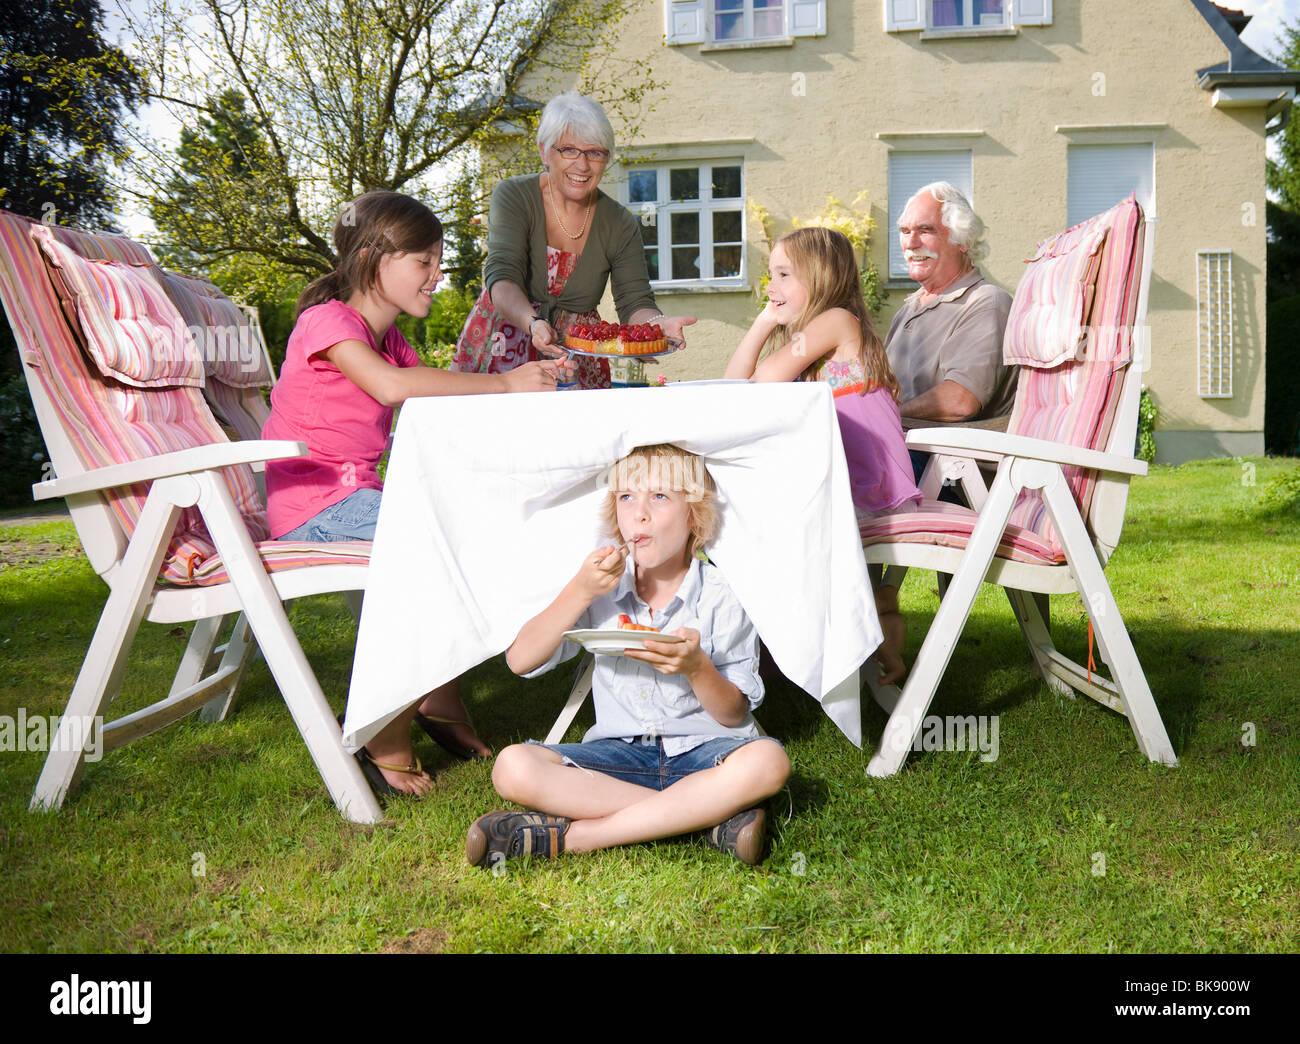 Abuela servir tarta de fresas Imagen De Stock